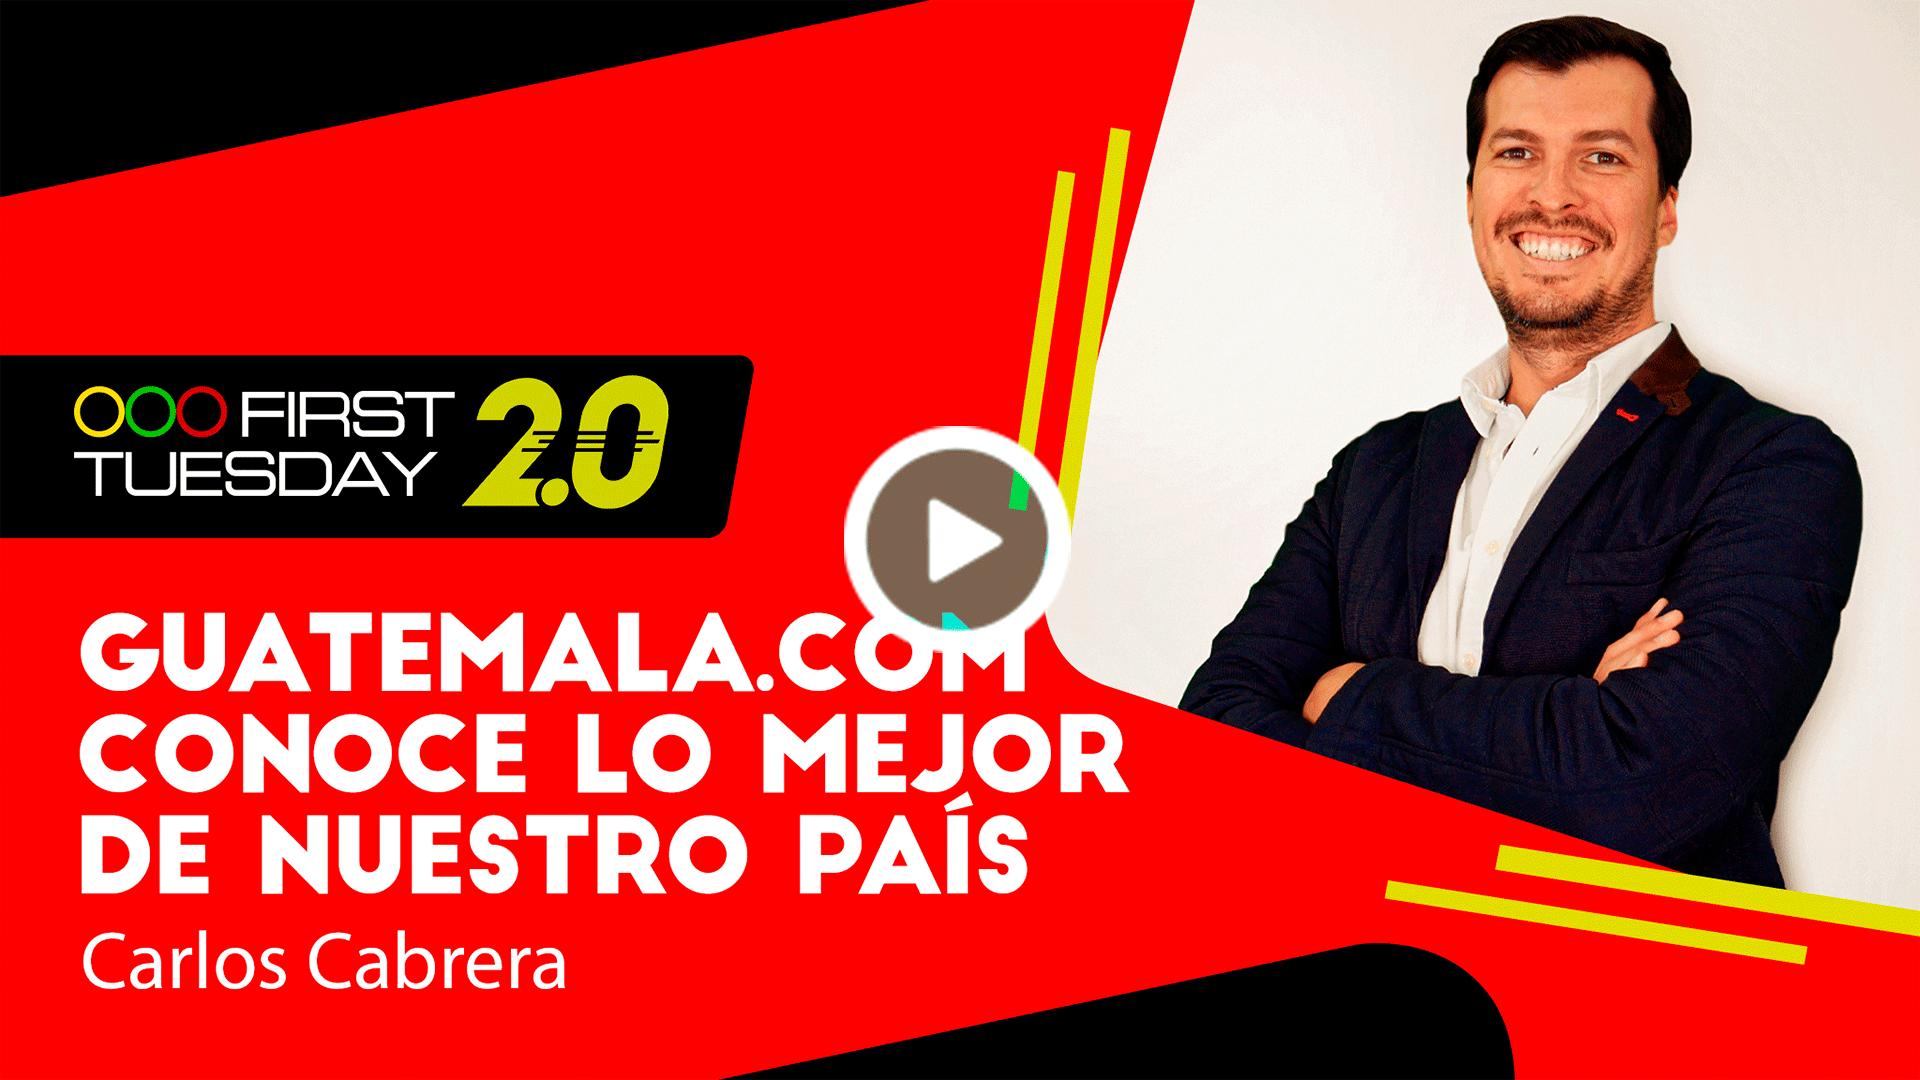 First_Tuesday_Carlos-Cabrera-1